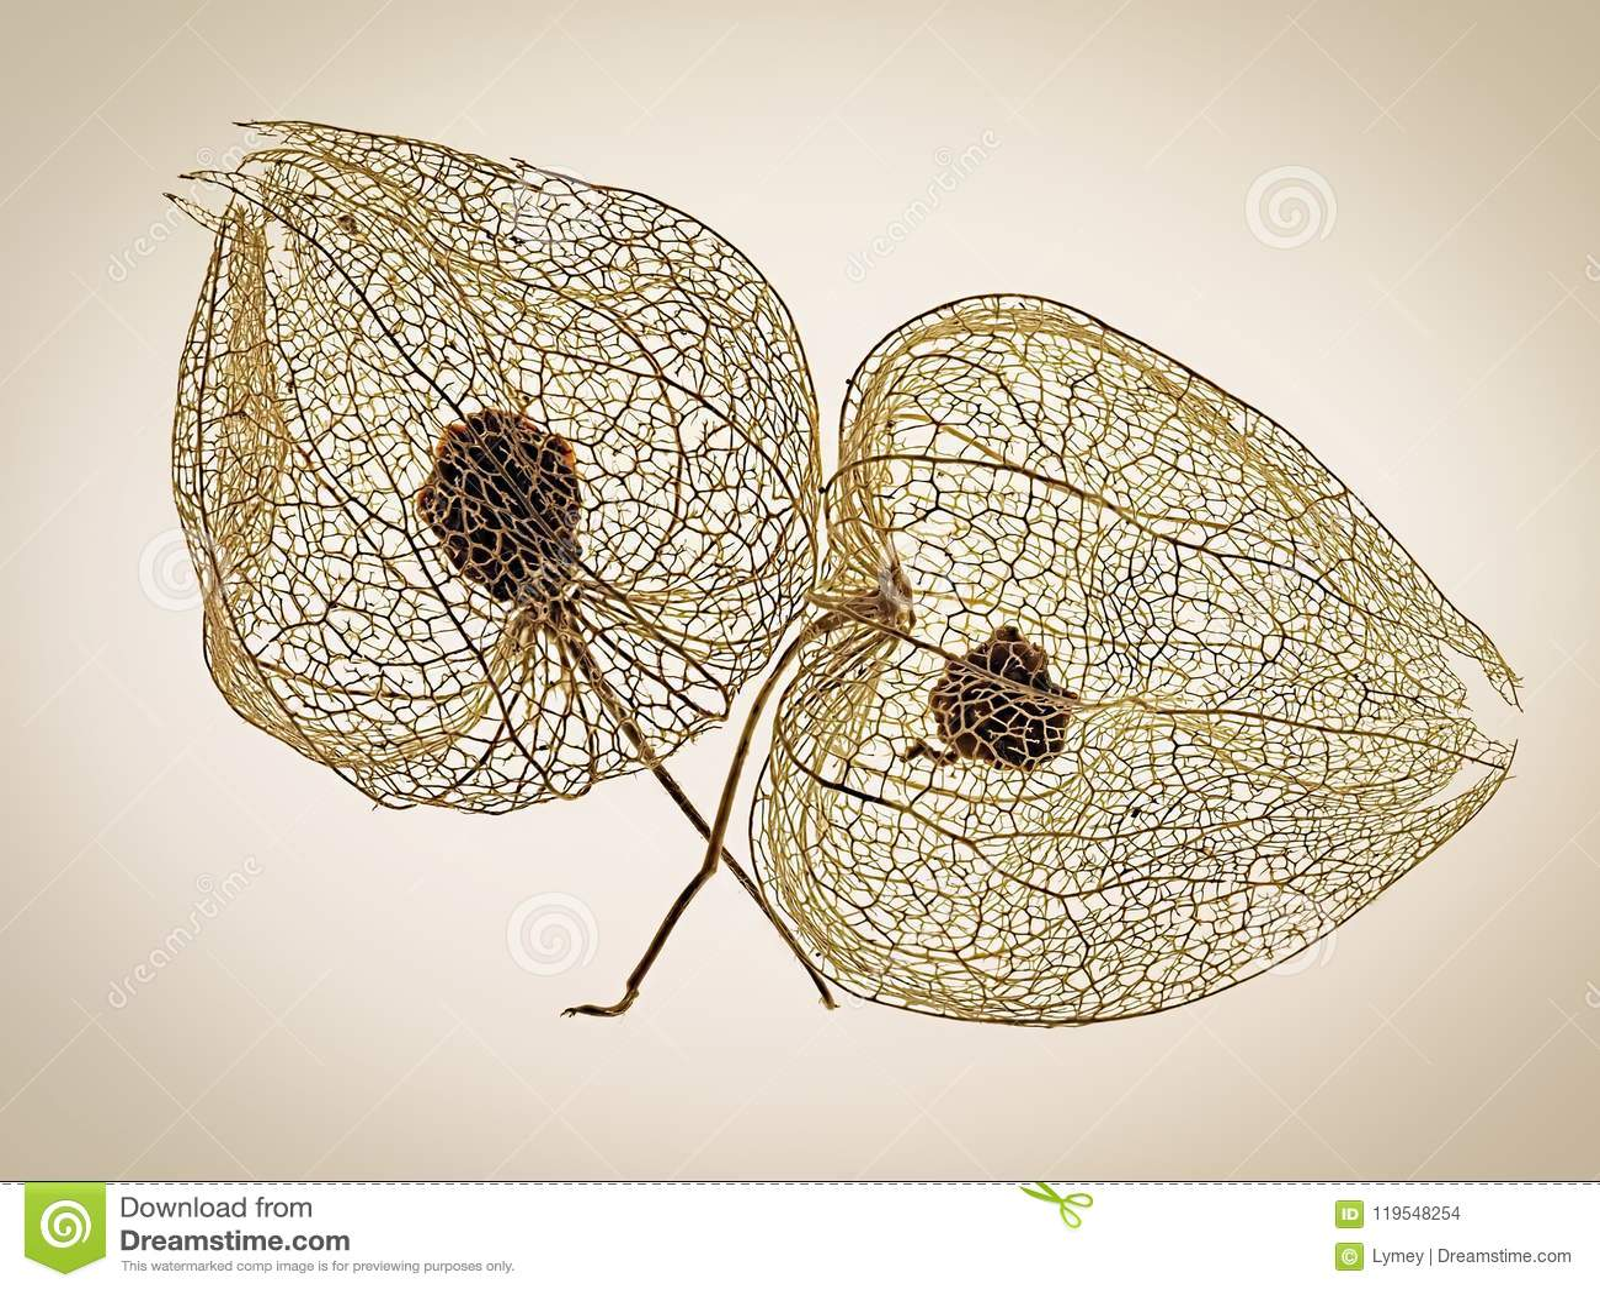 Patterns In Nature - Chinese Lantern Seedheads